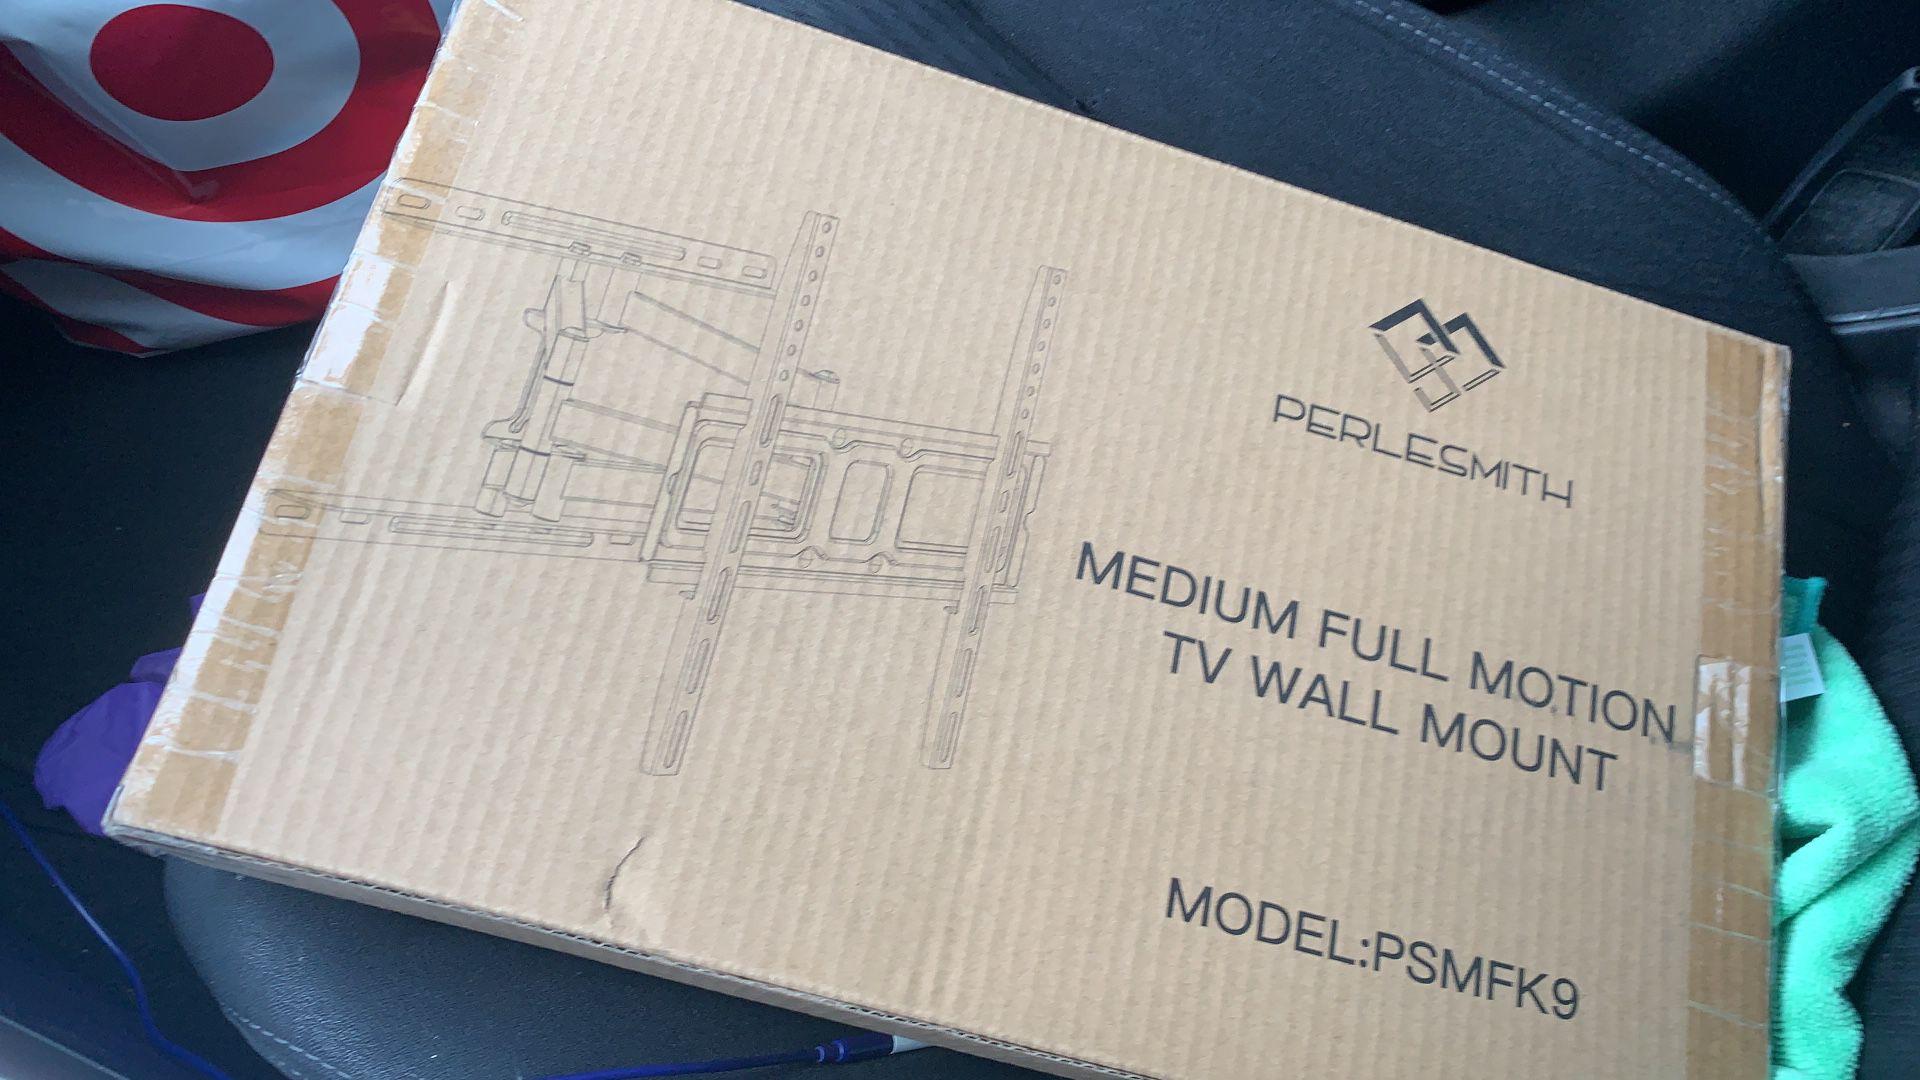 TV full motion wall mount